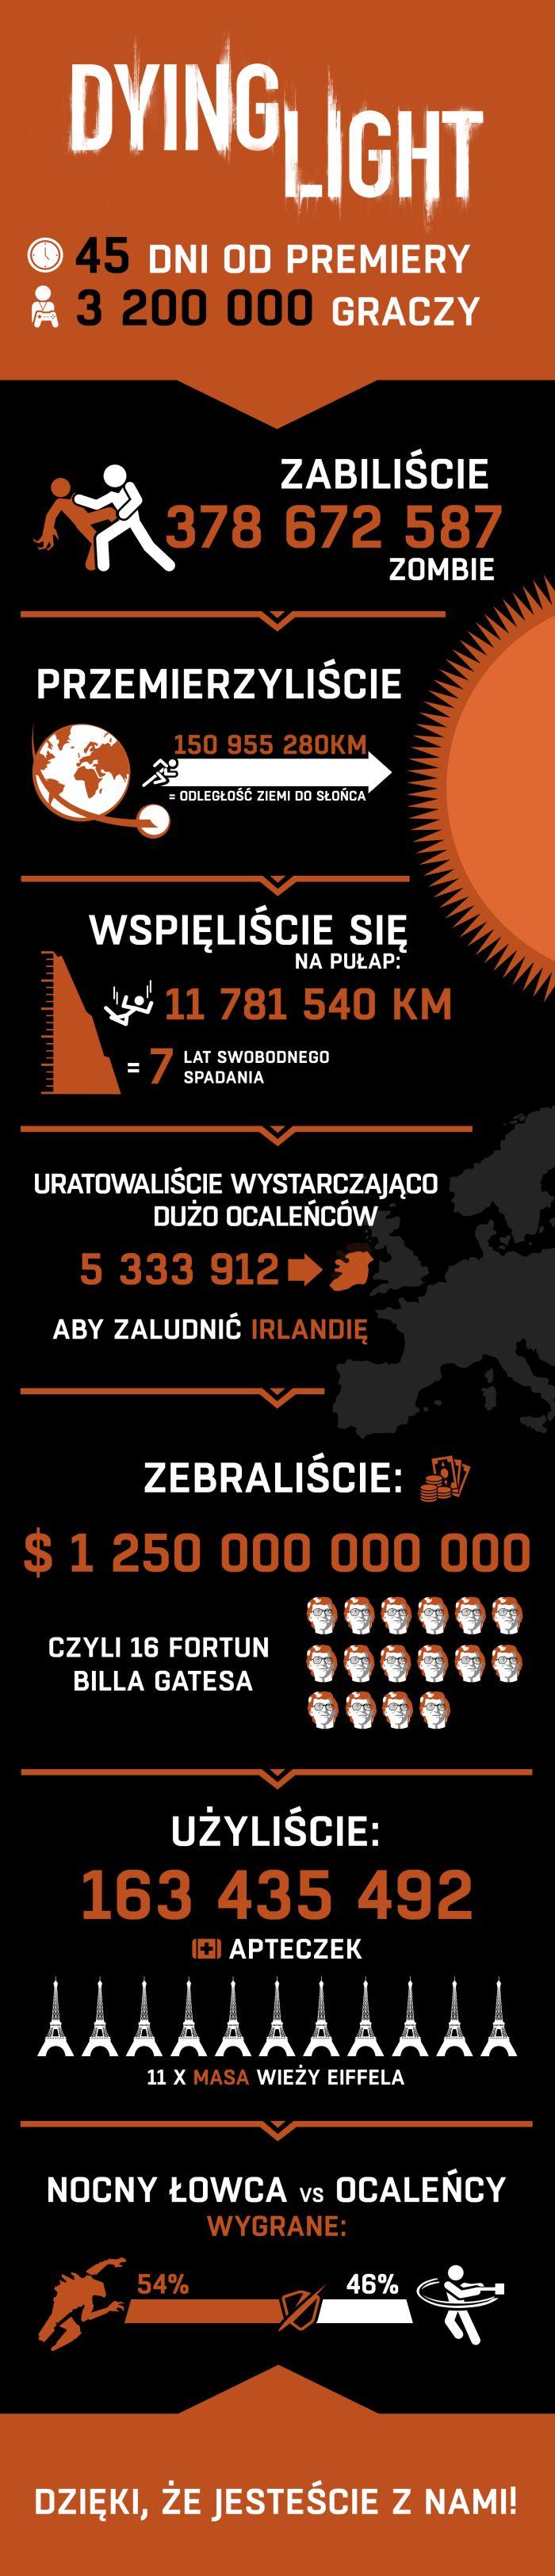 DL-infographic-pl